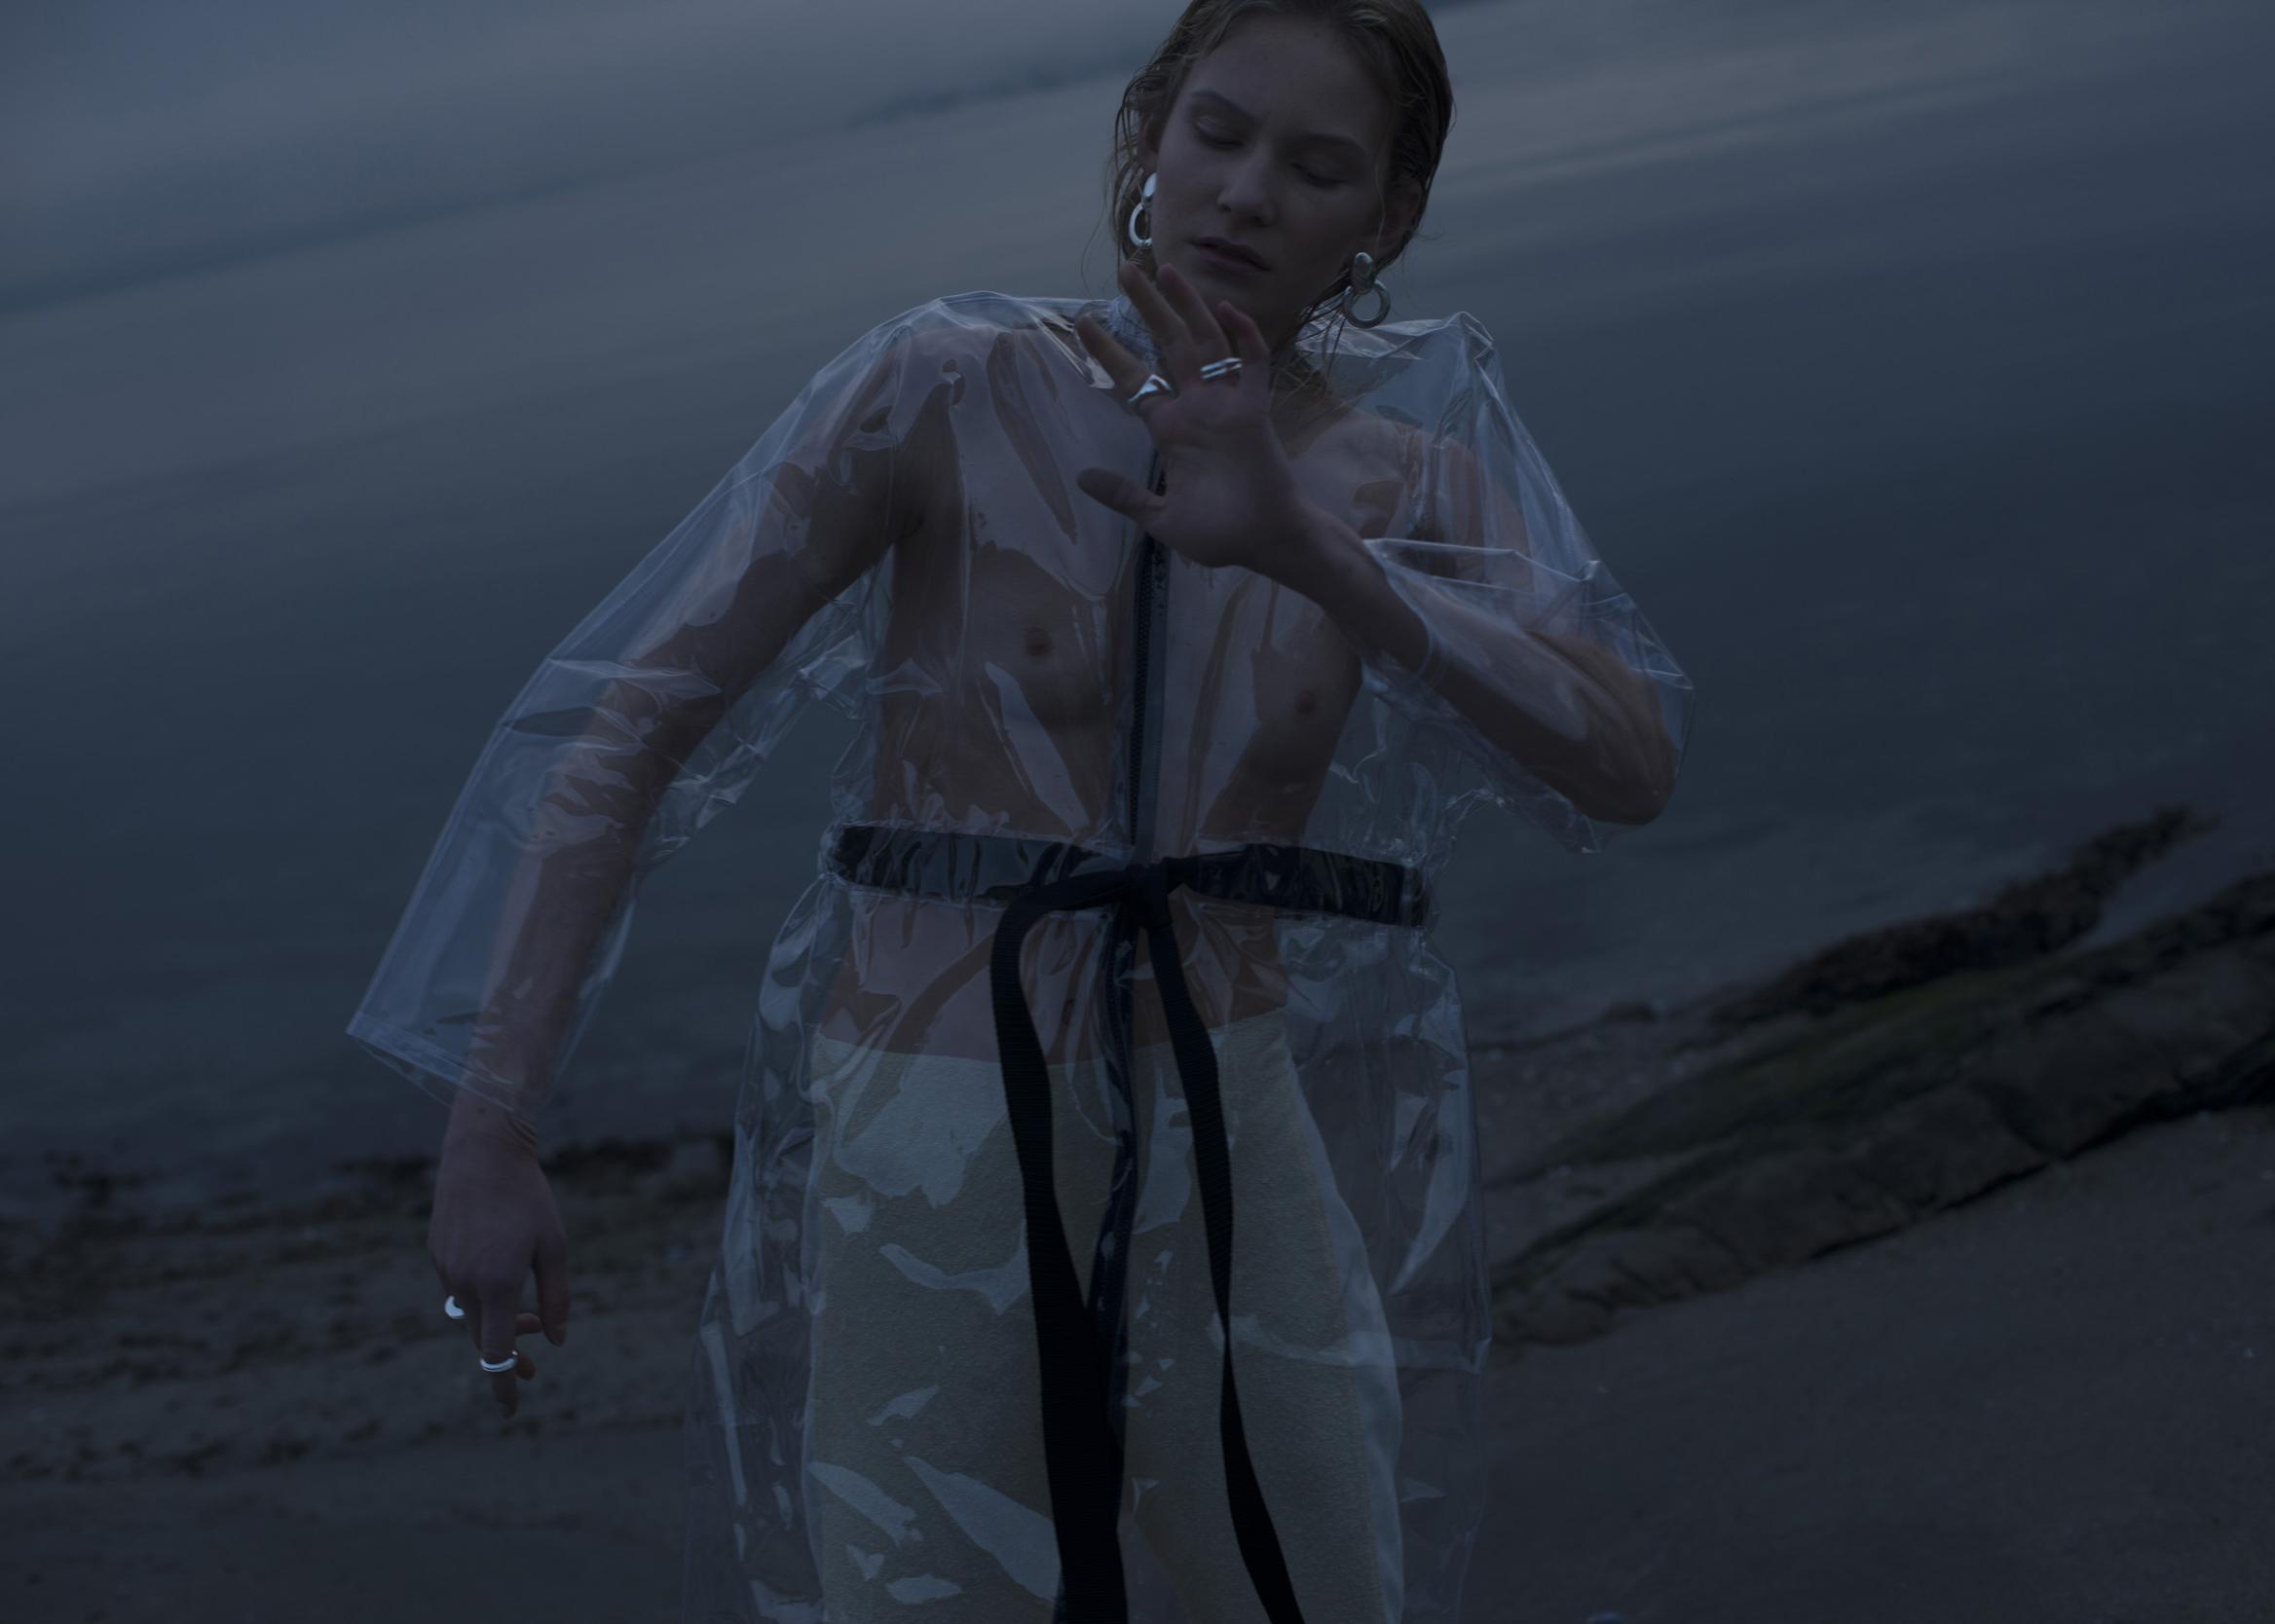 Amalie for SVA magazine